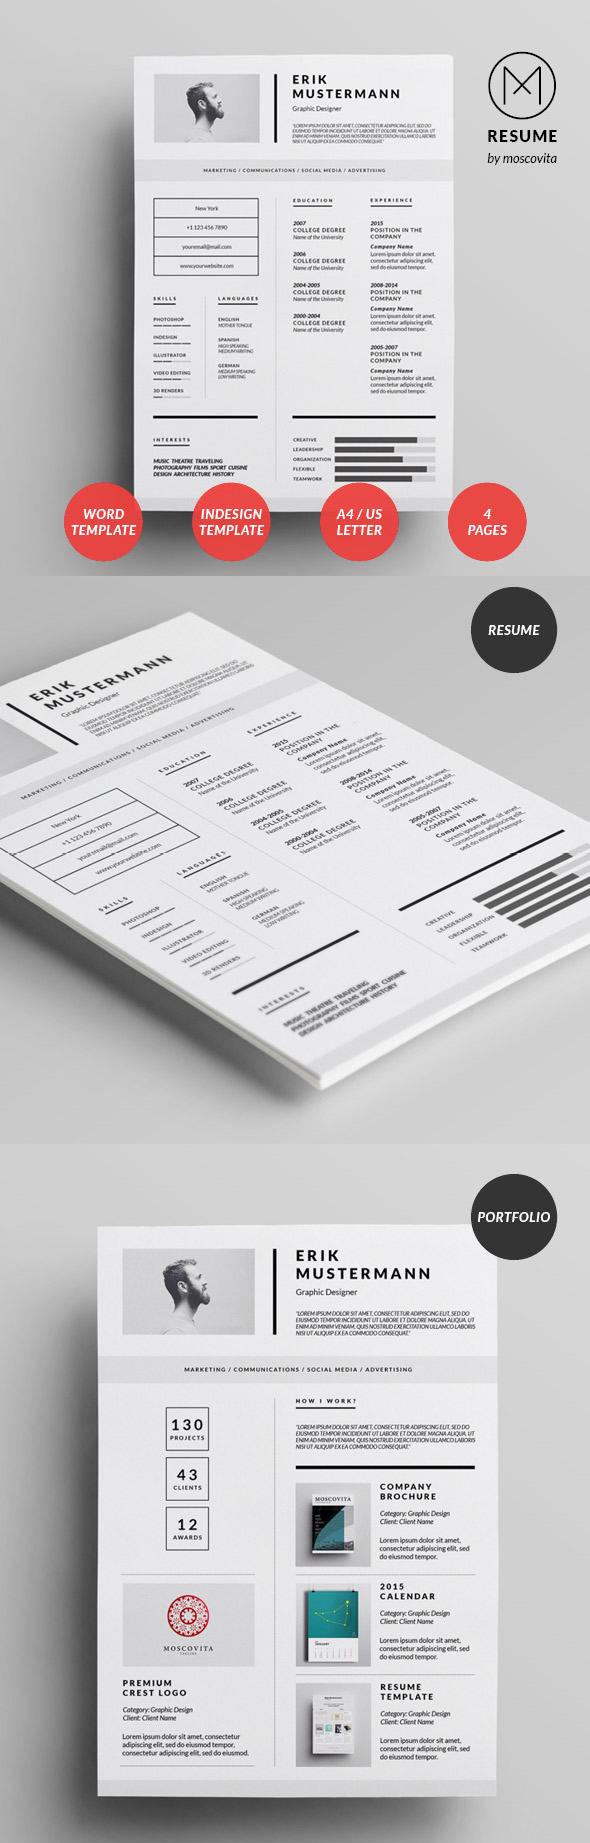 50 Best Minimal Resume Templates - 20